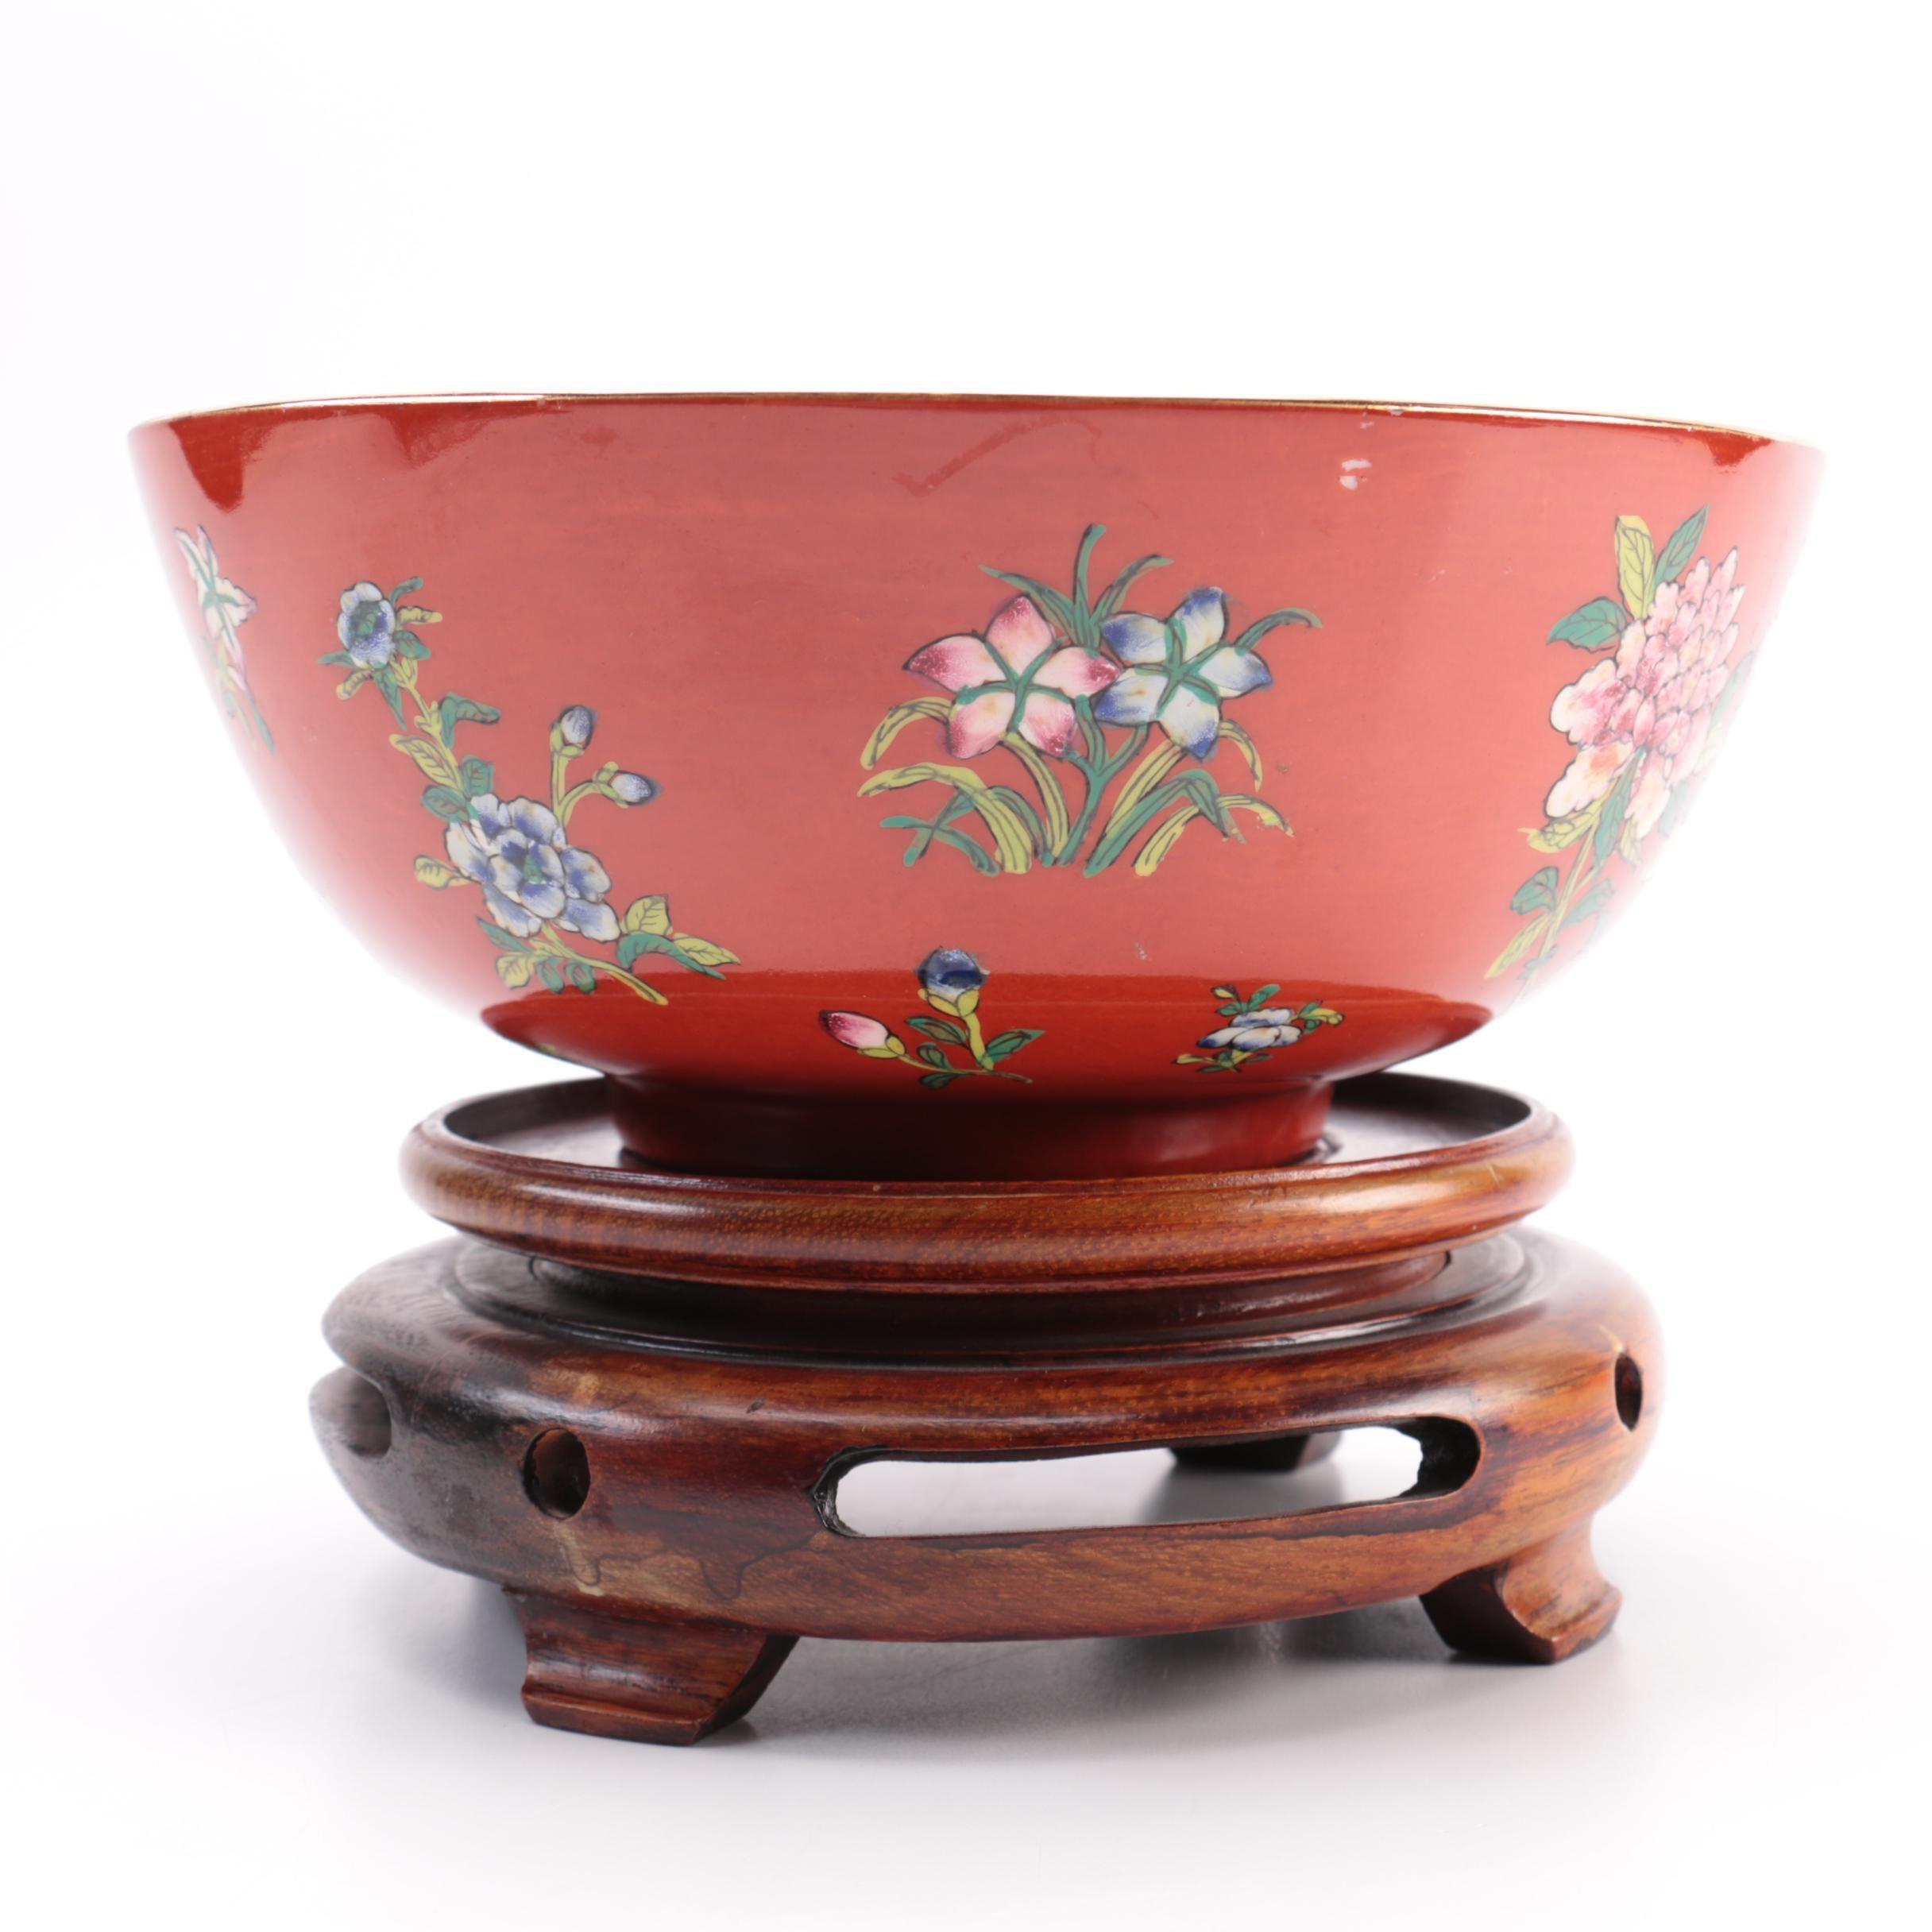 Red Ceramic Floral Bowl